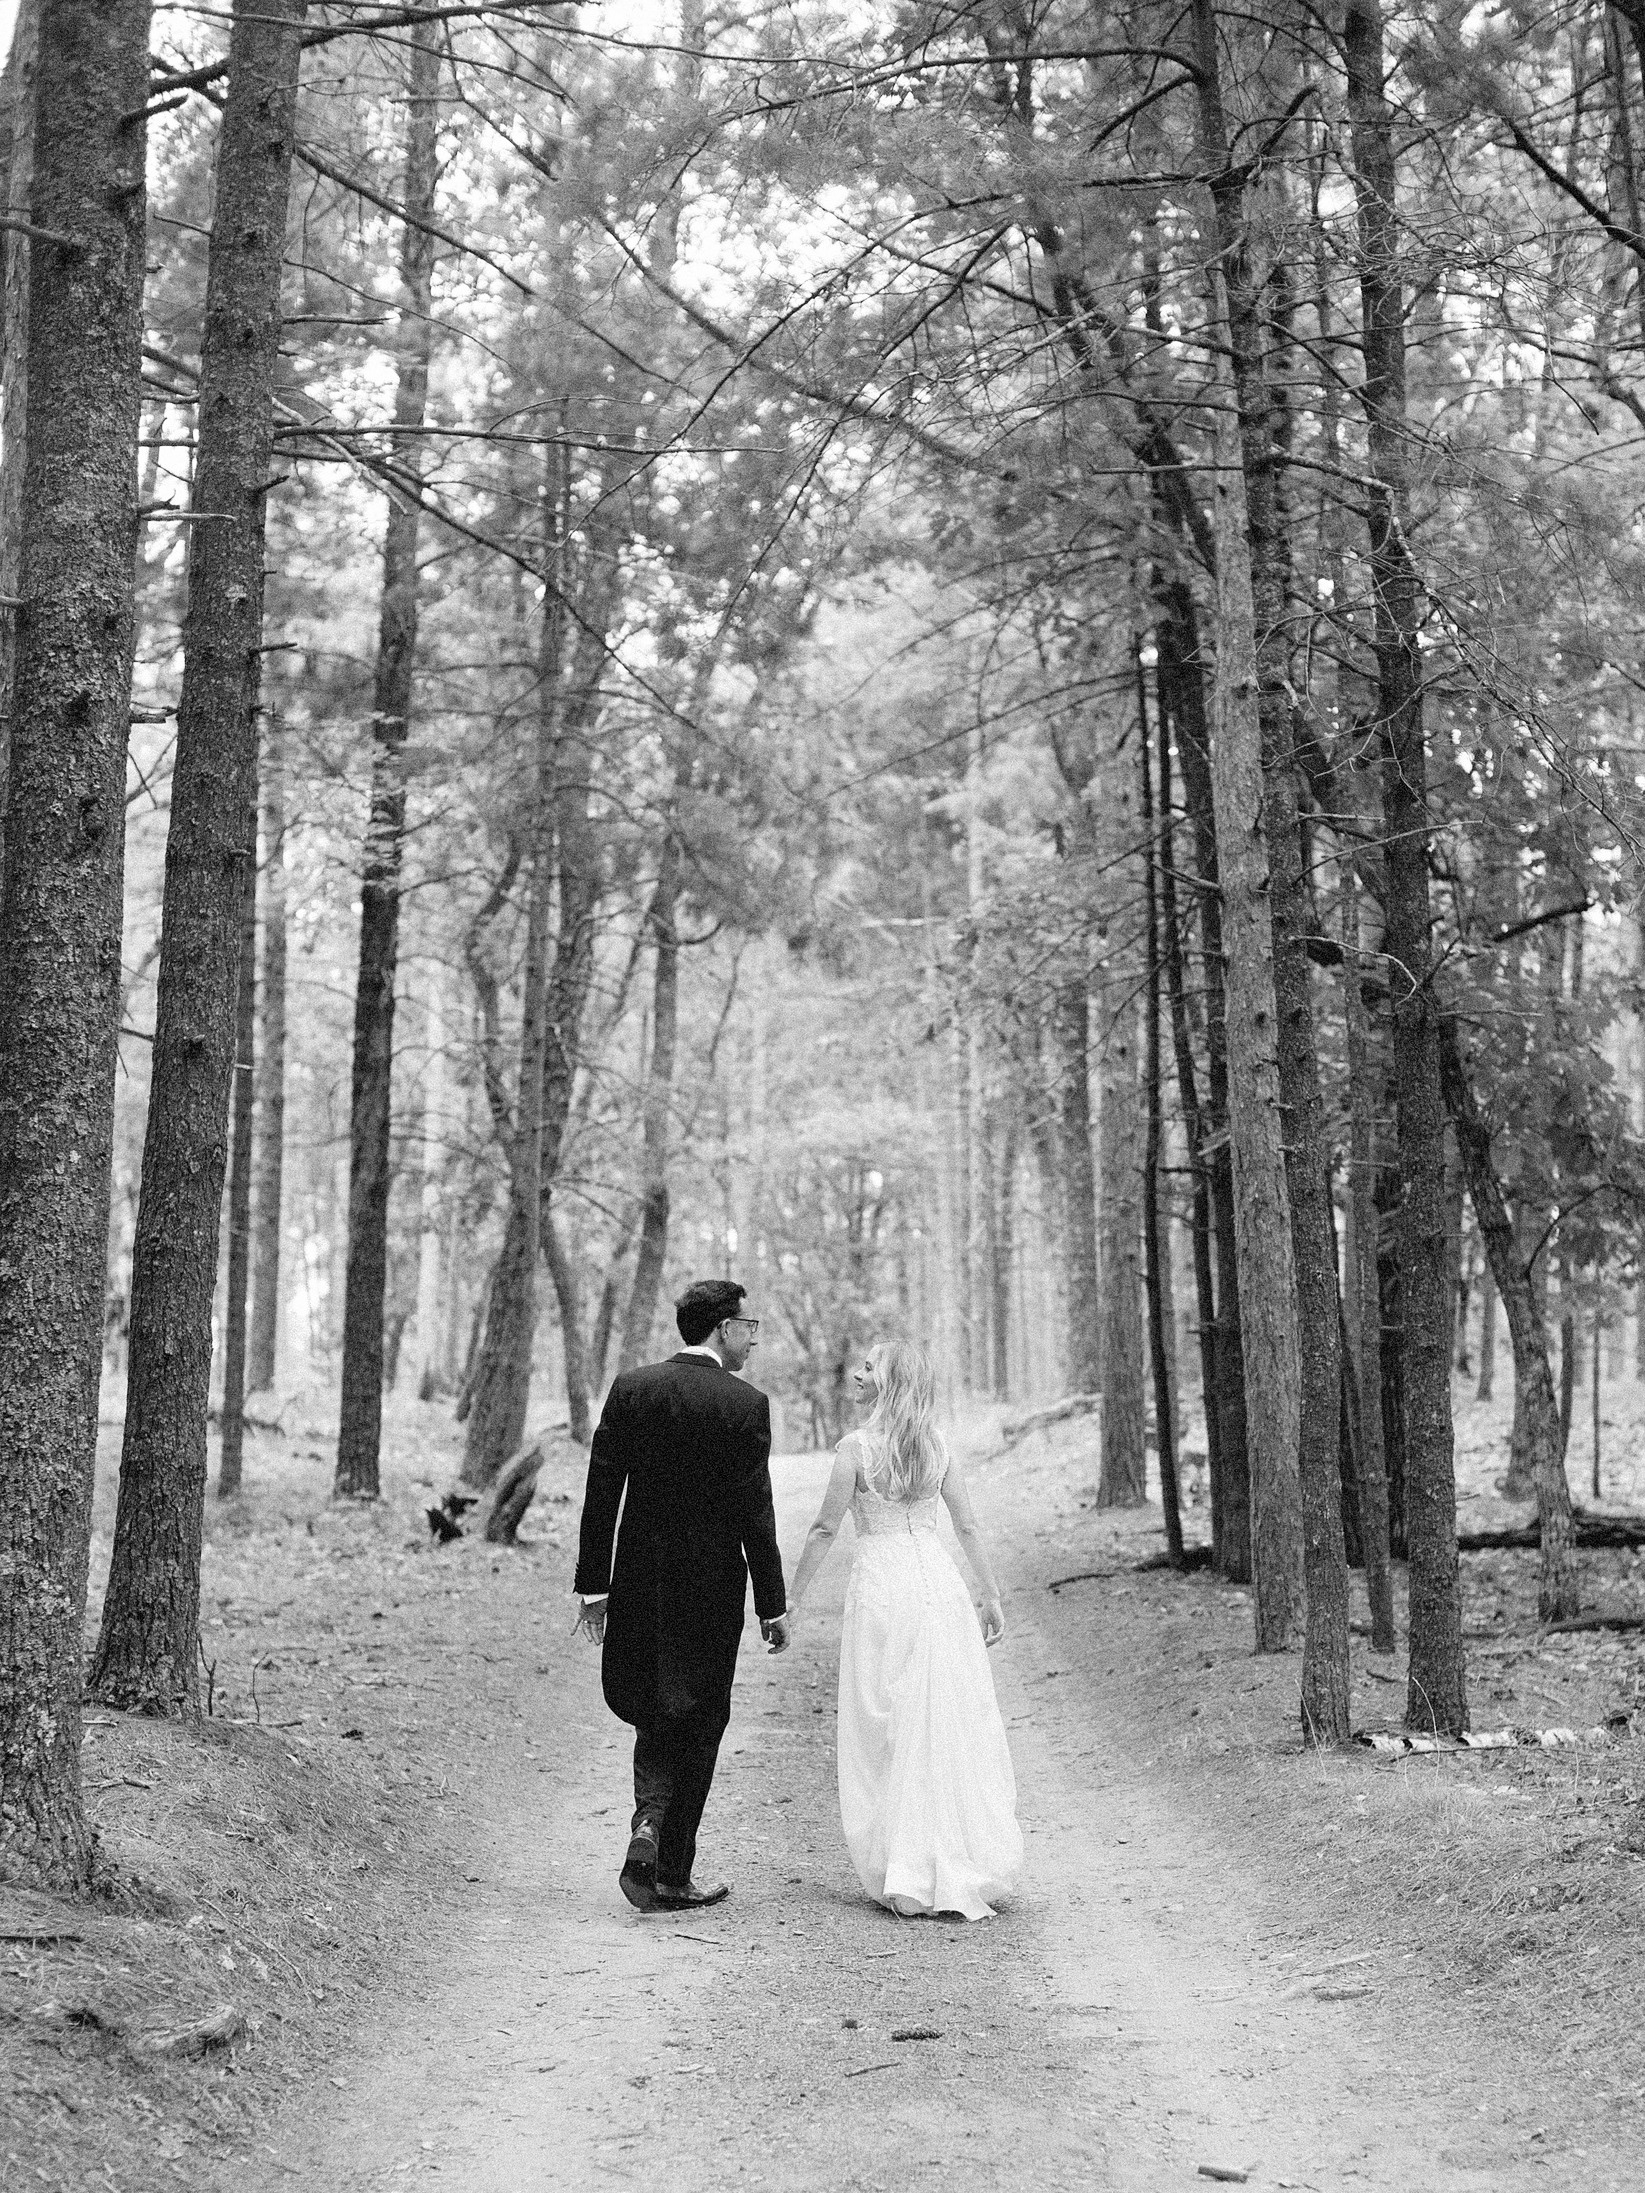 adele seth wedding michigan couple walking path